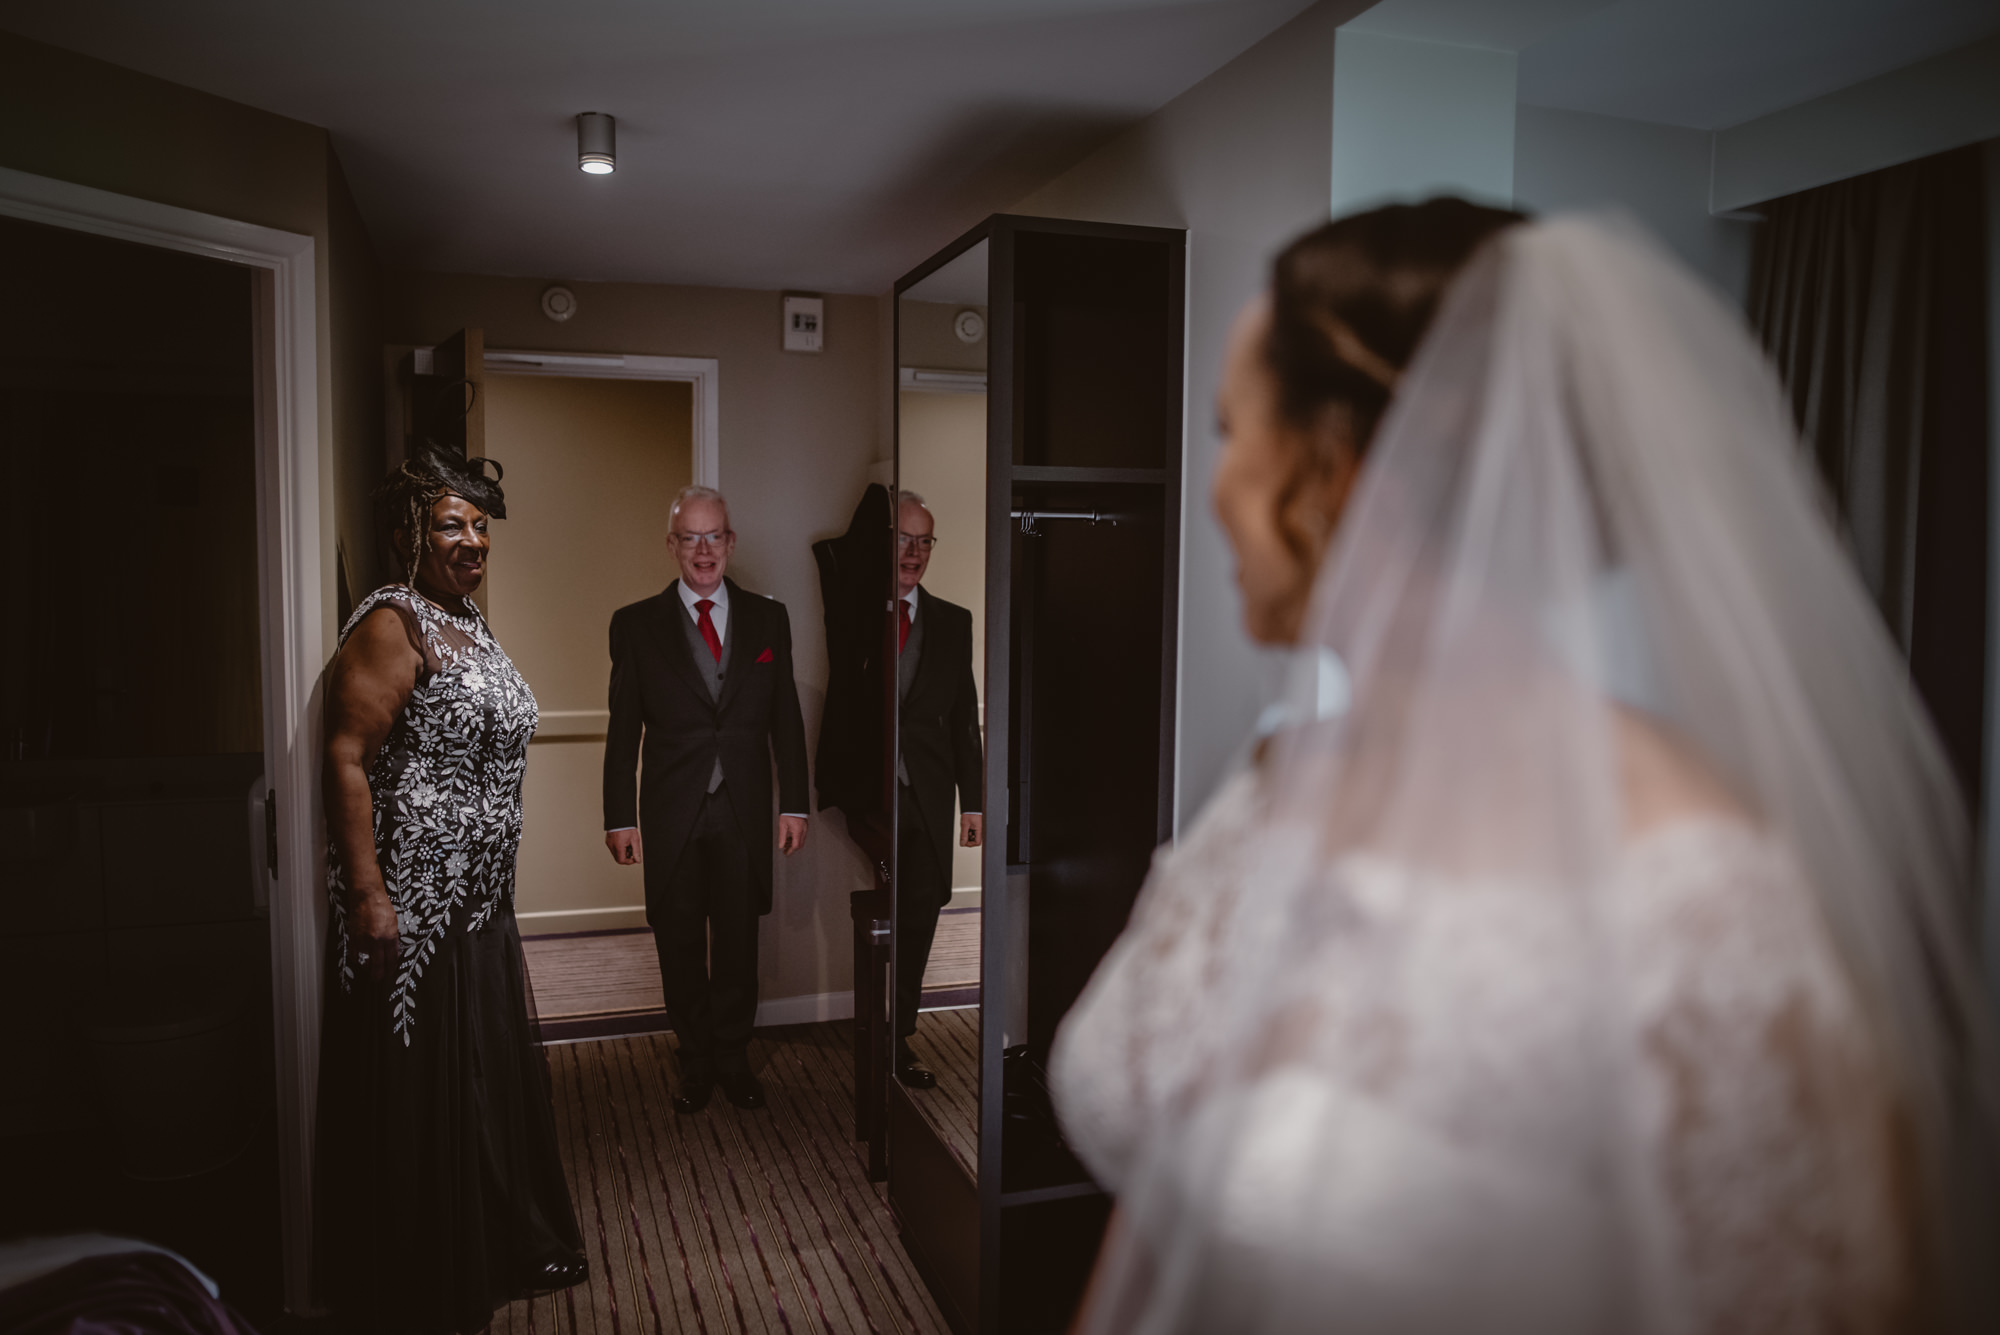 Jacqueline-Gareth-Wedding-Westmead-Events-Surrey-Manu-Mendoza-Wedding-Photography-140.jpg